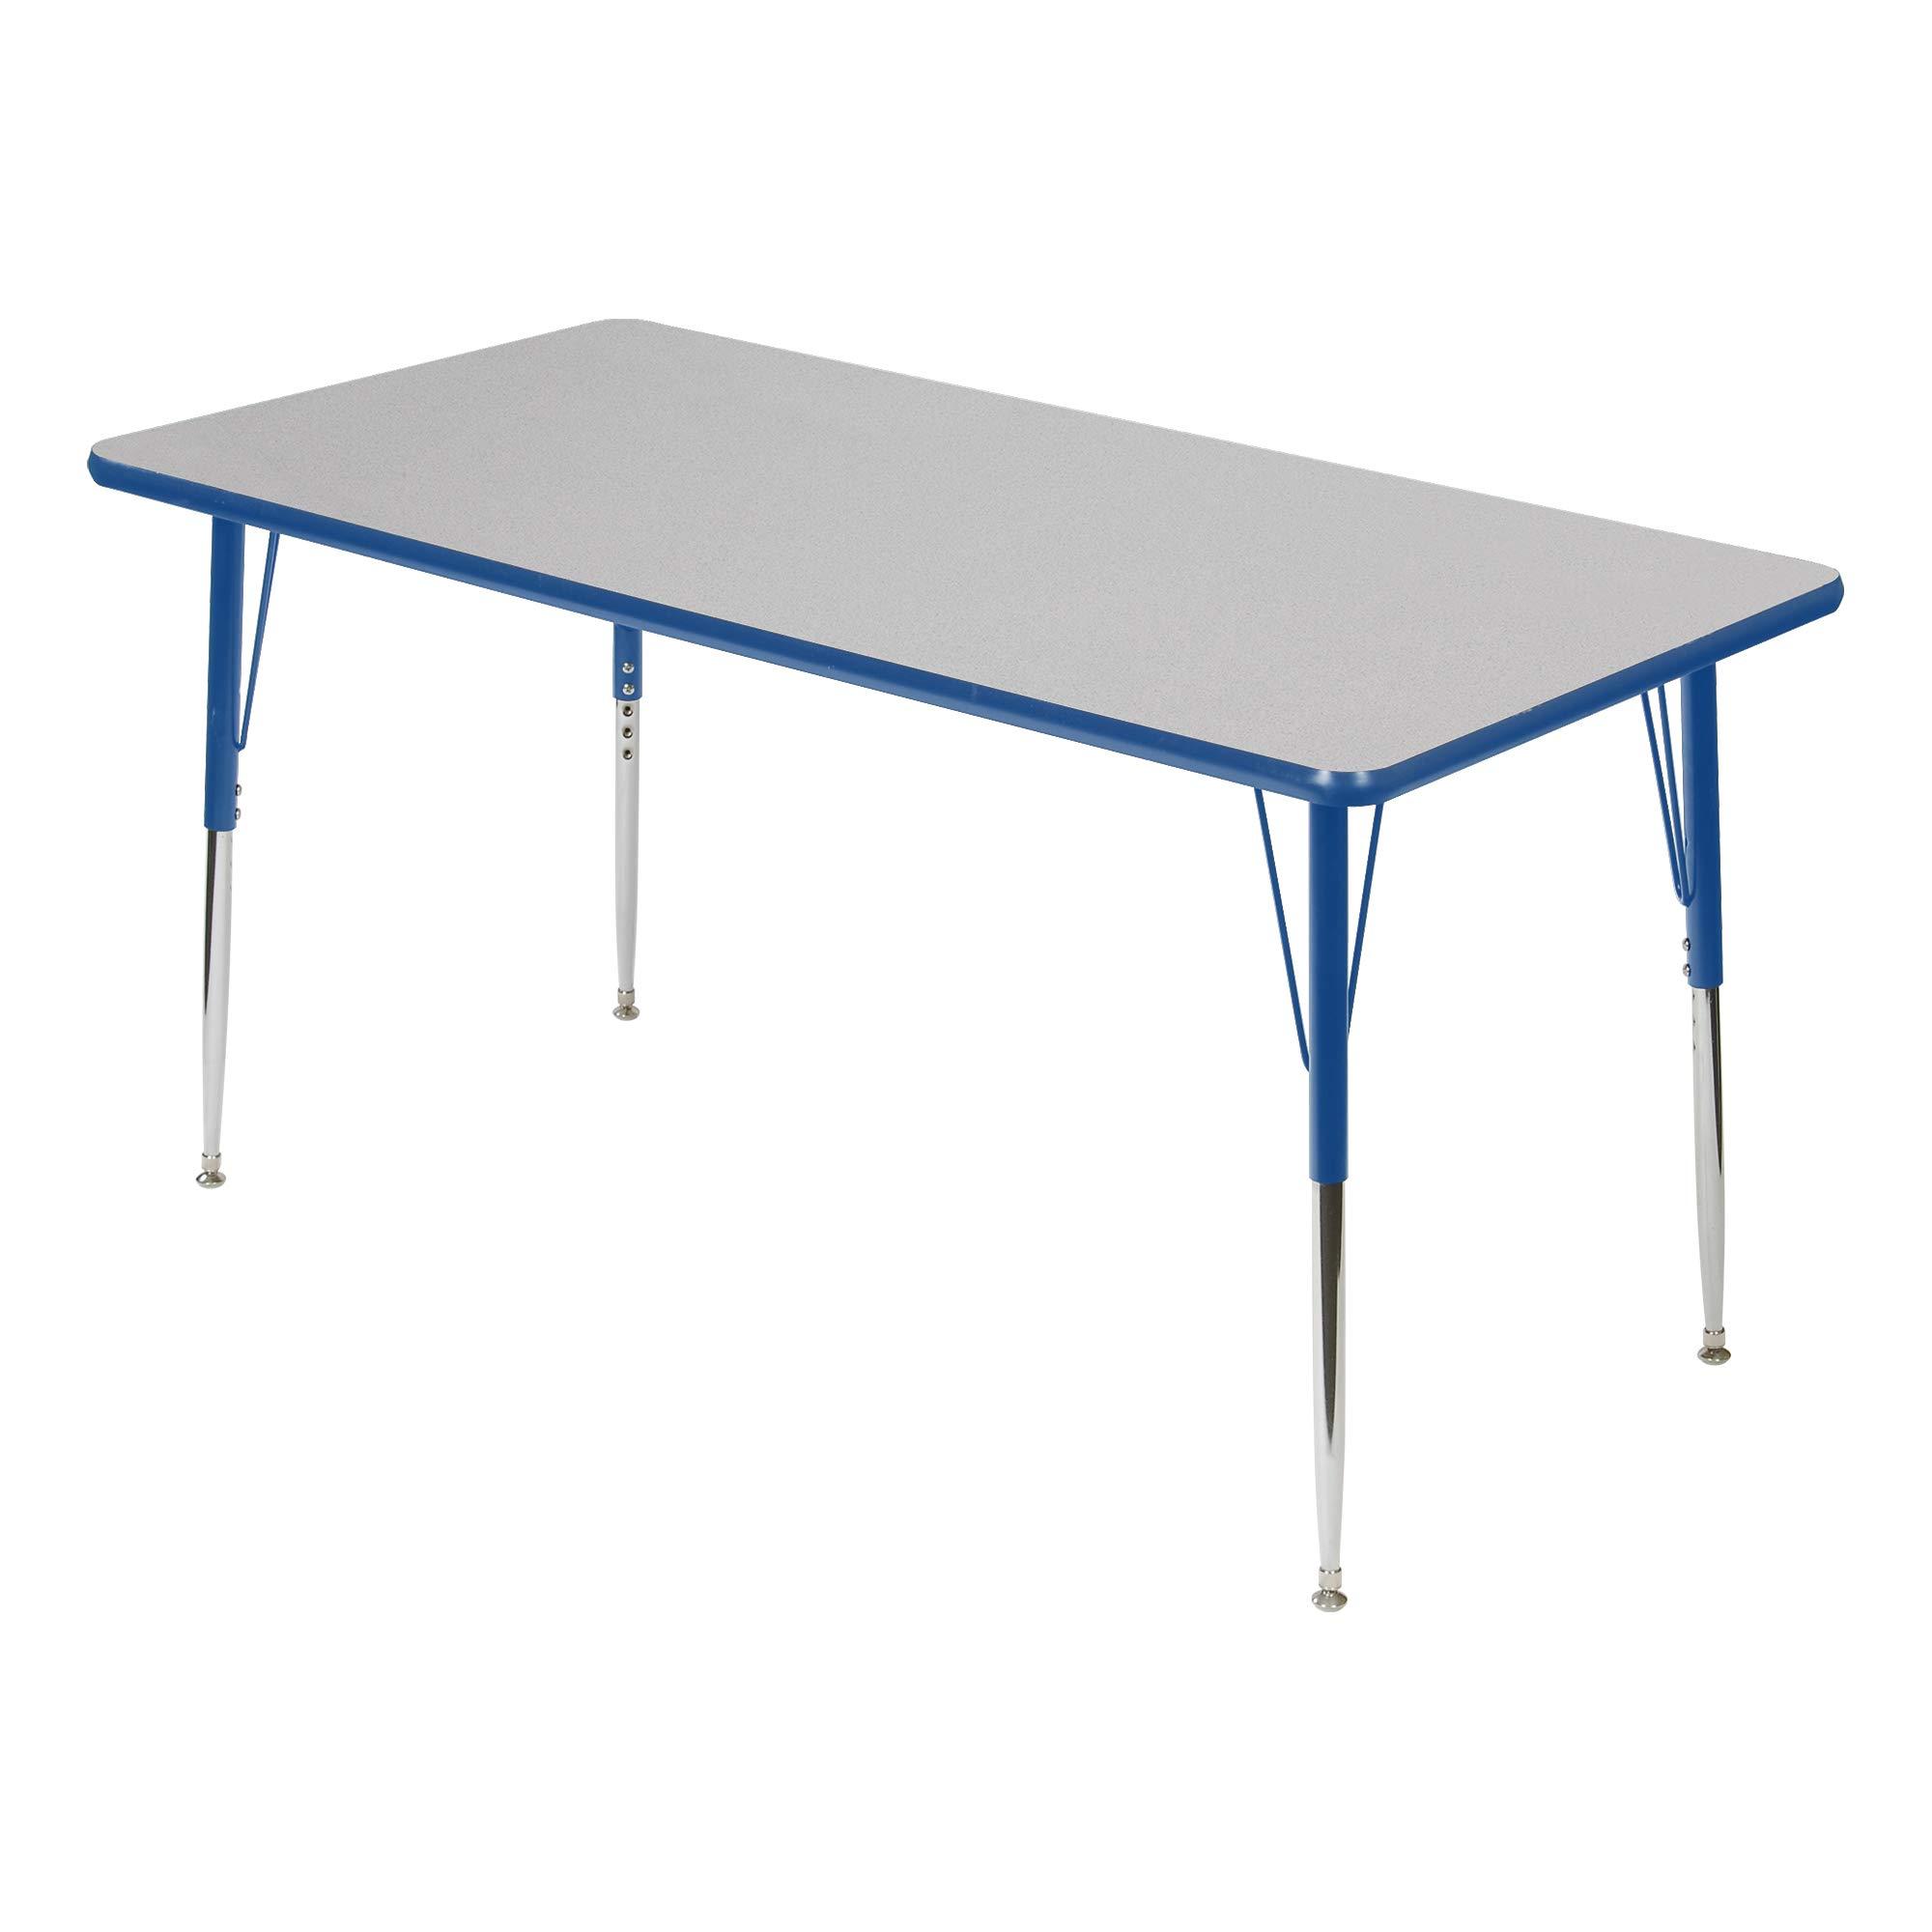 Rectangle Adjustable Height School Classroom Activity Table (30'' W x 72'' L) - Gray Nebula Top/Blue Edge